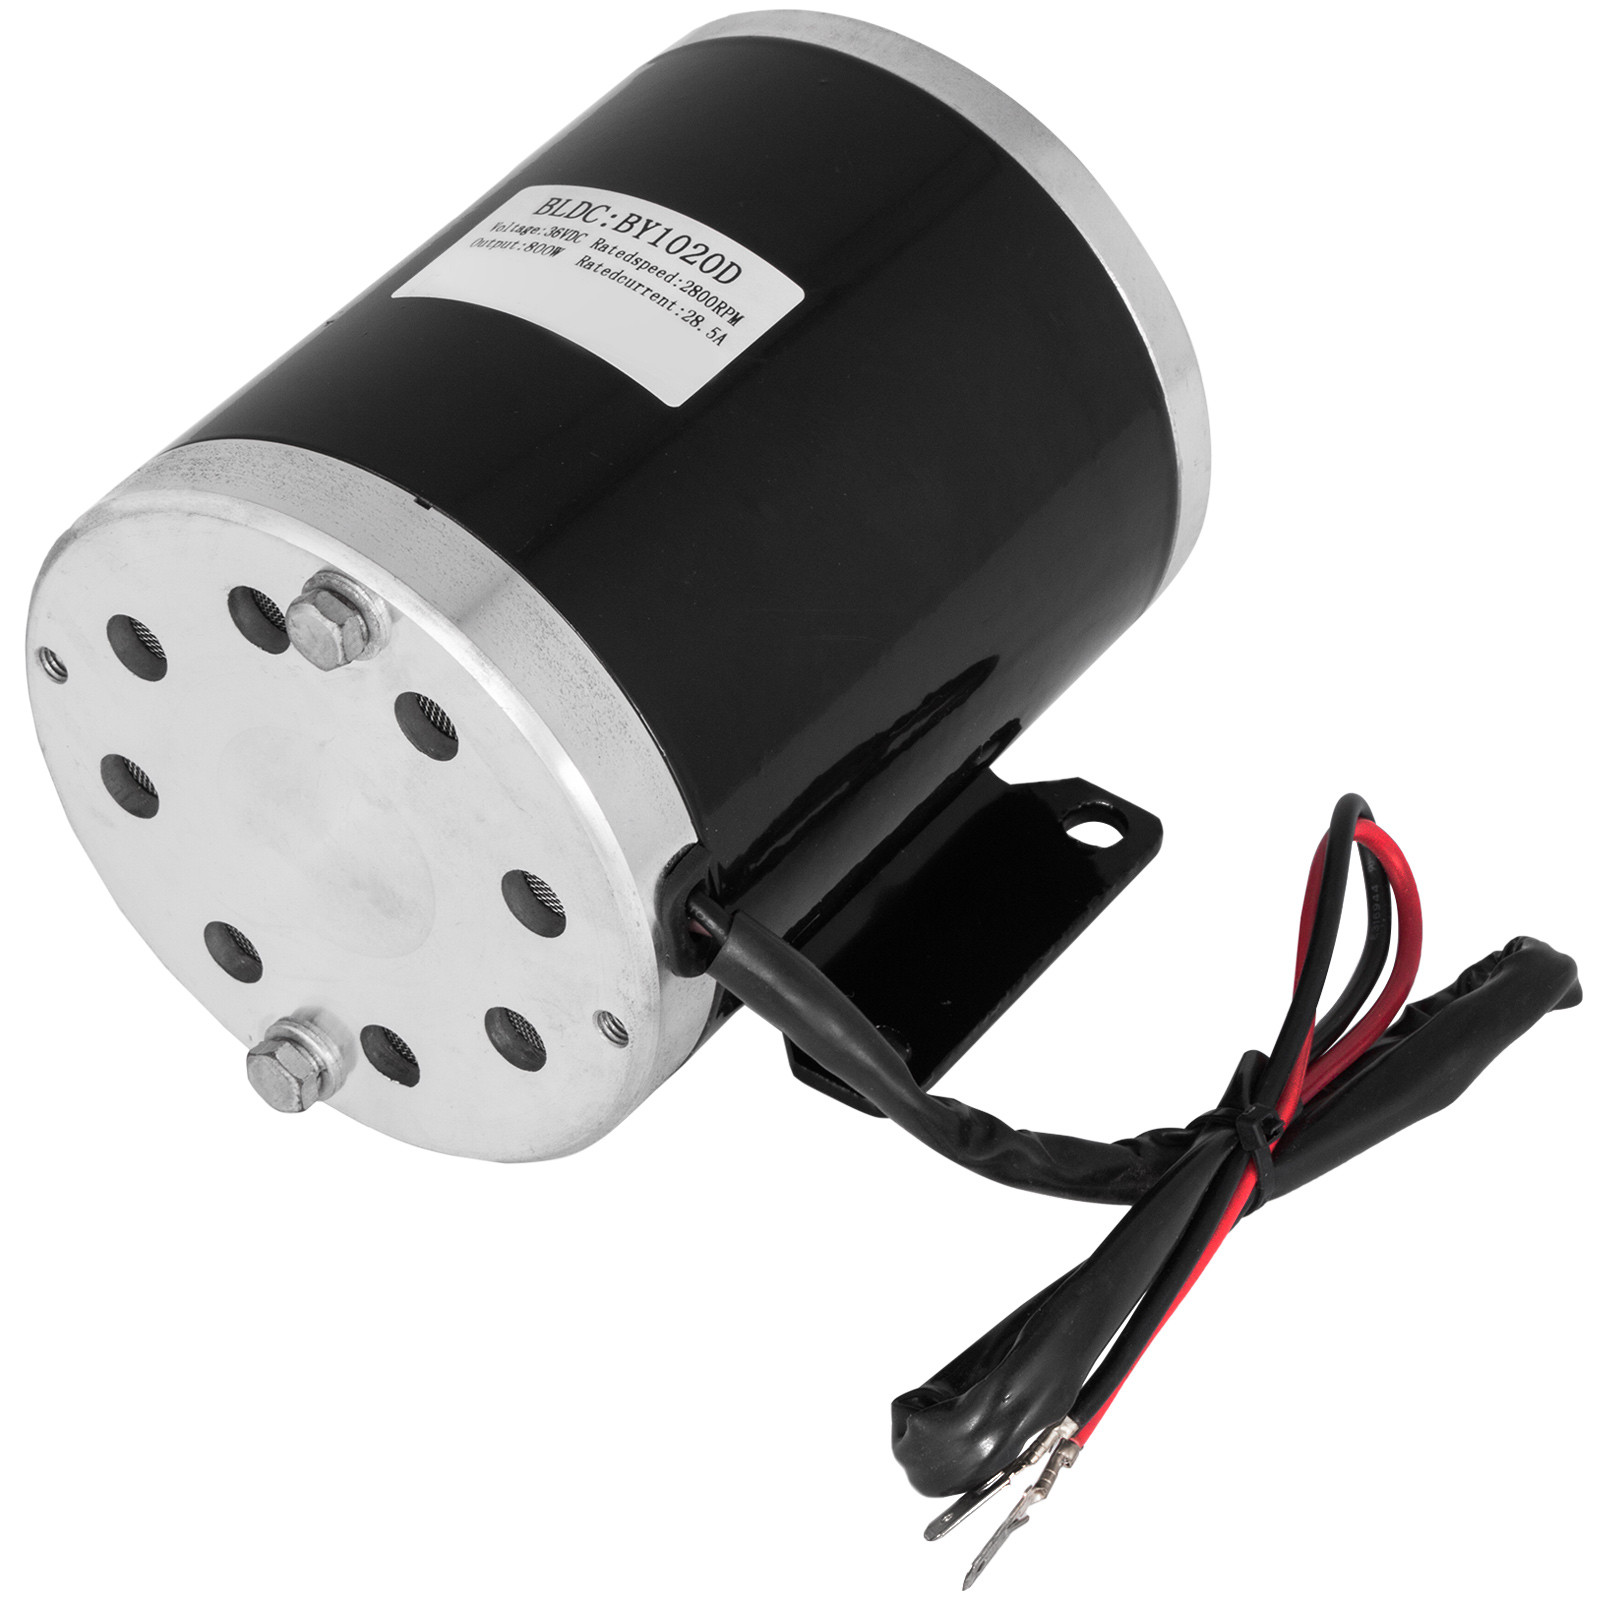 36v-Electric-Motor-controller-throttle-kit-f-Scooter-E-Scooter-ATV-Permanent thumbnail 76